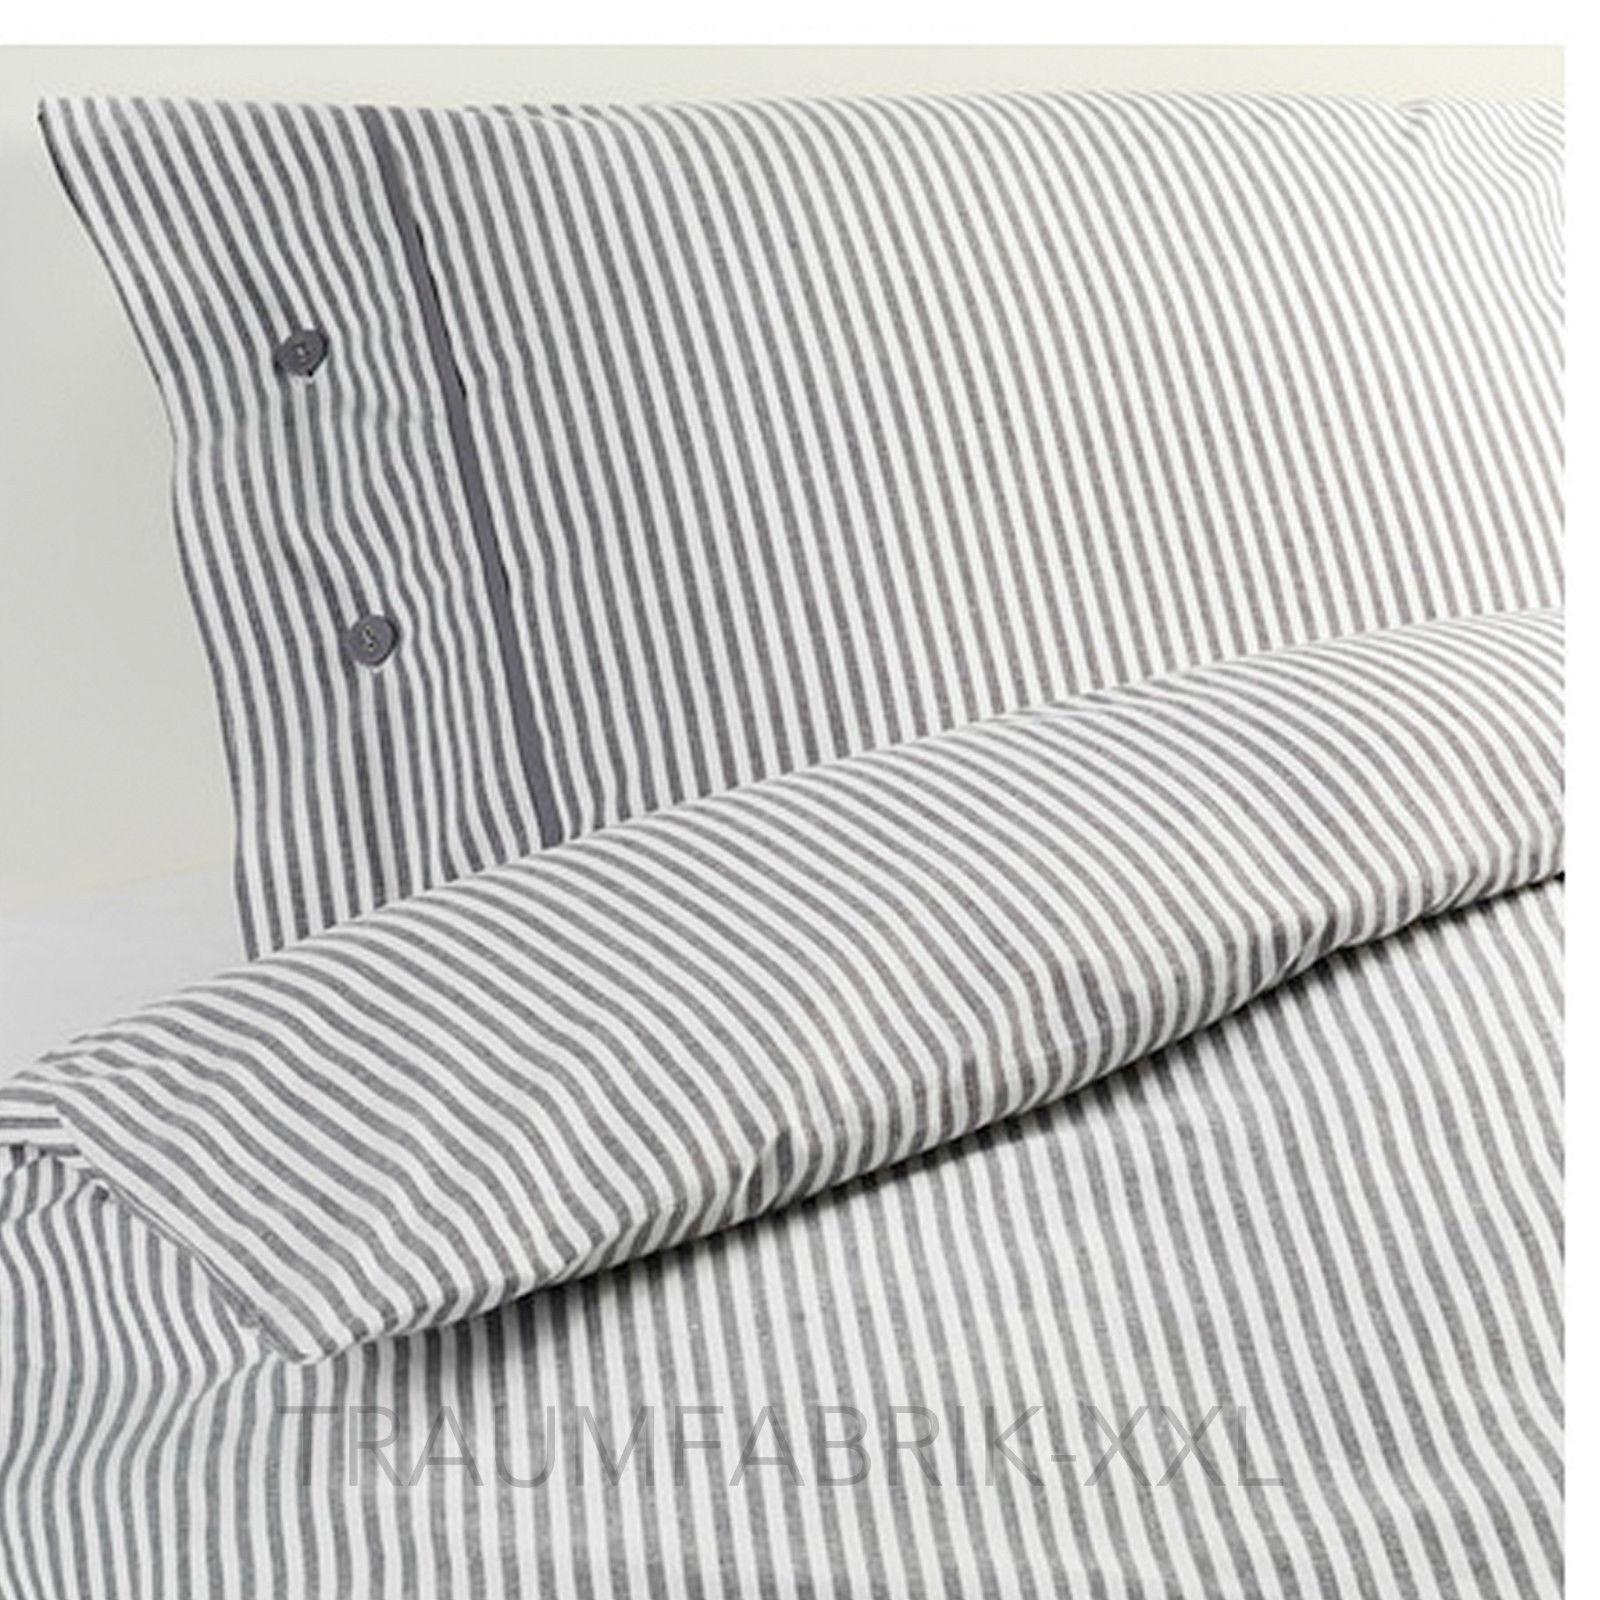 Karierte Bettwäsche Ikea Bettwäsche Ikea Puderviva Set 140x200cm